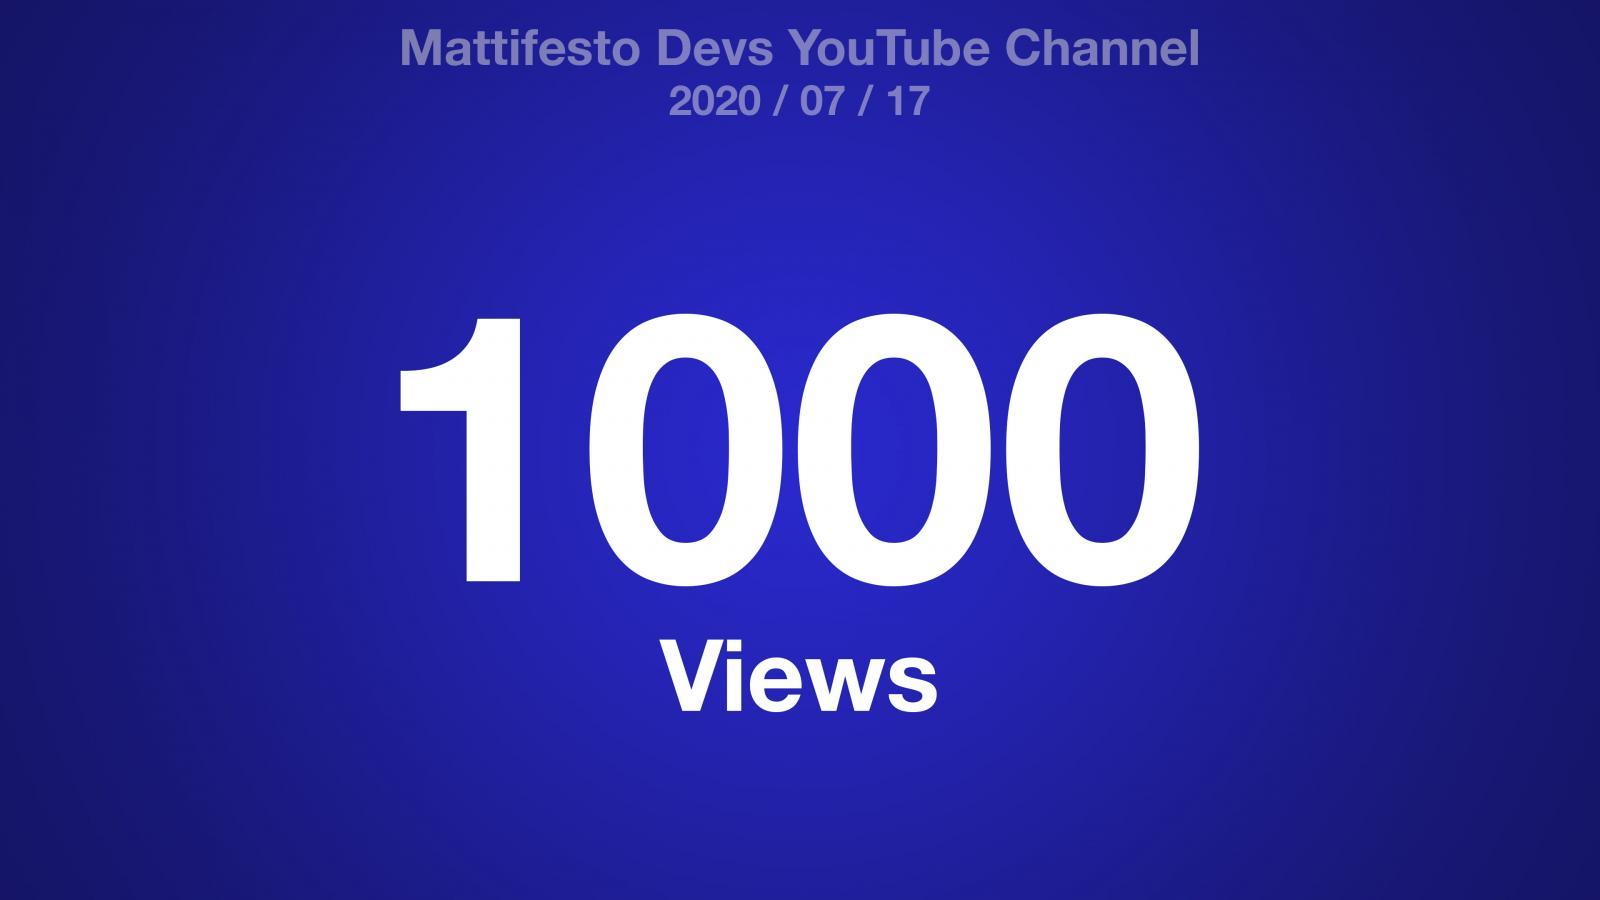 Blue gradient with the text: Mattifesto Devs YouTube Channel 2020/07/17 1000 Views